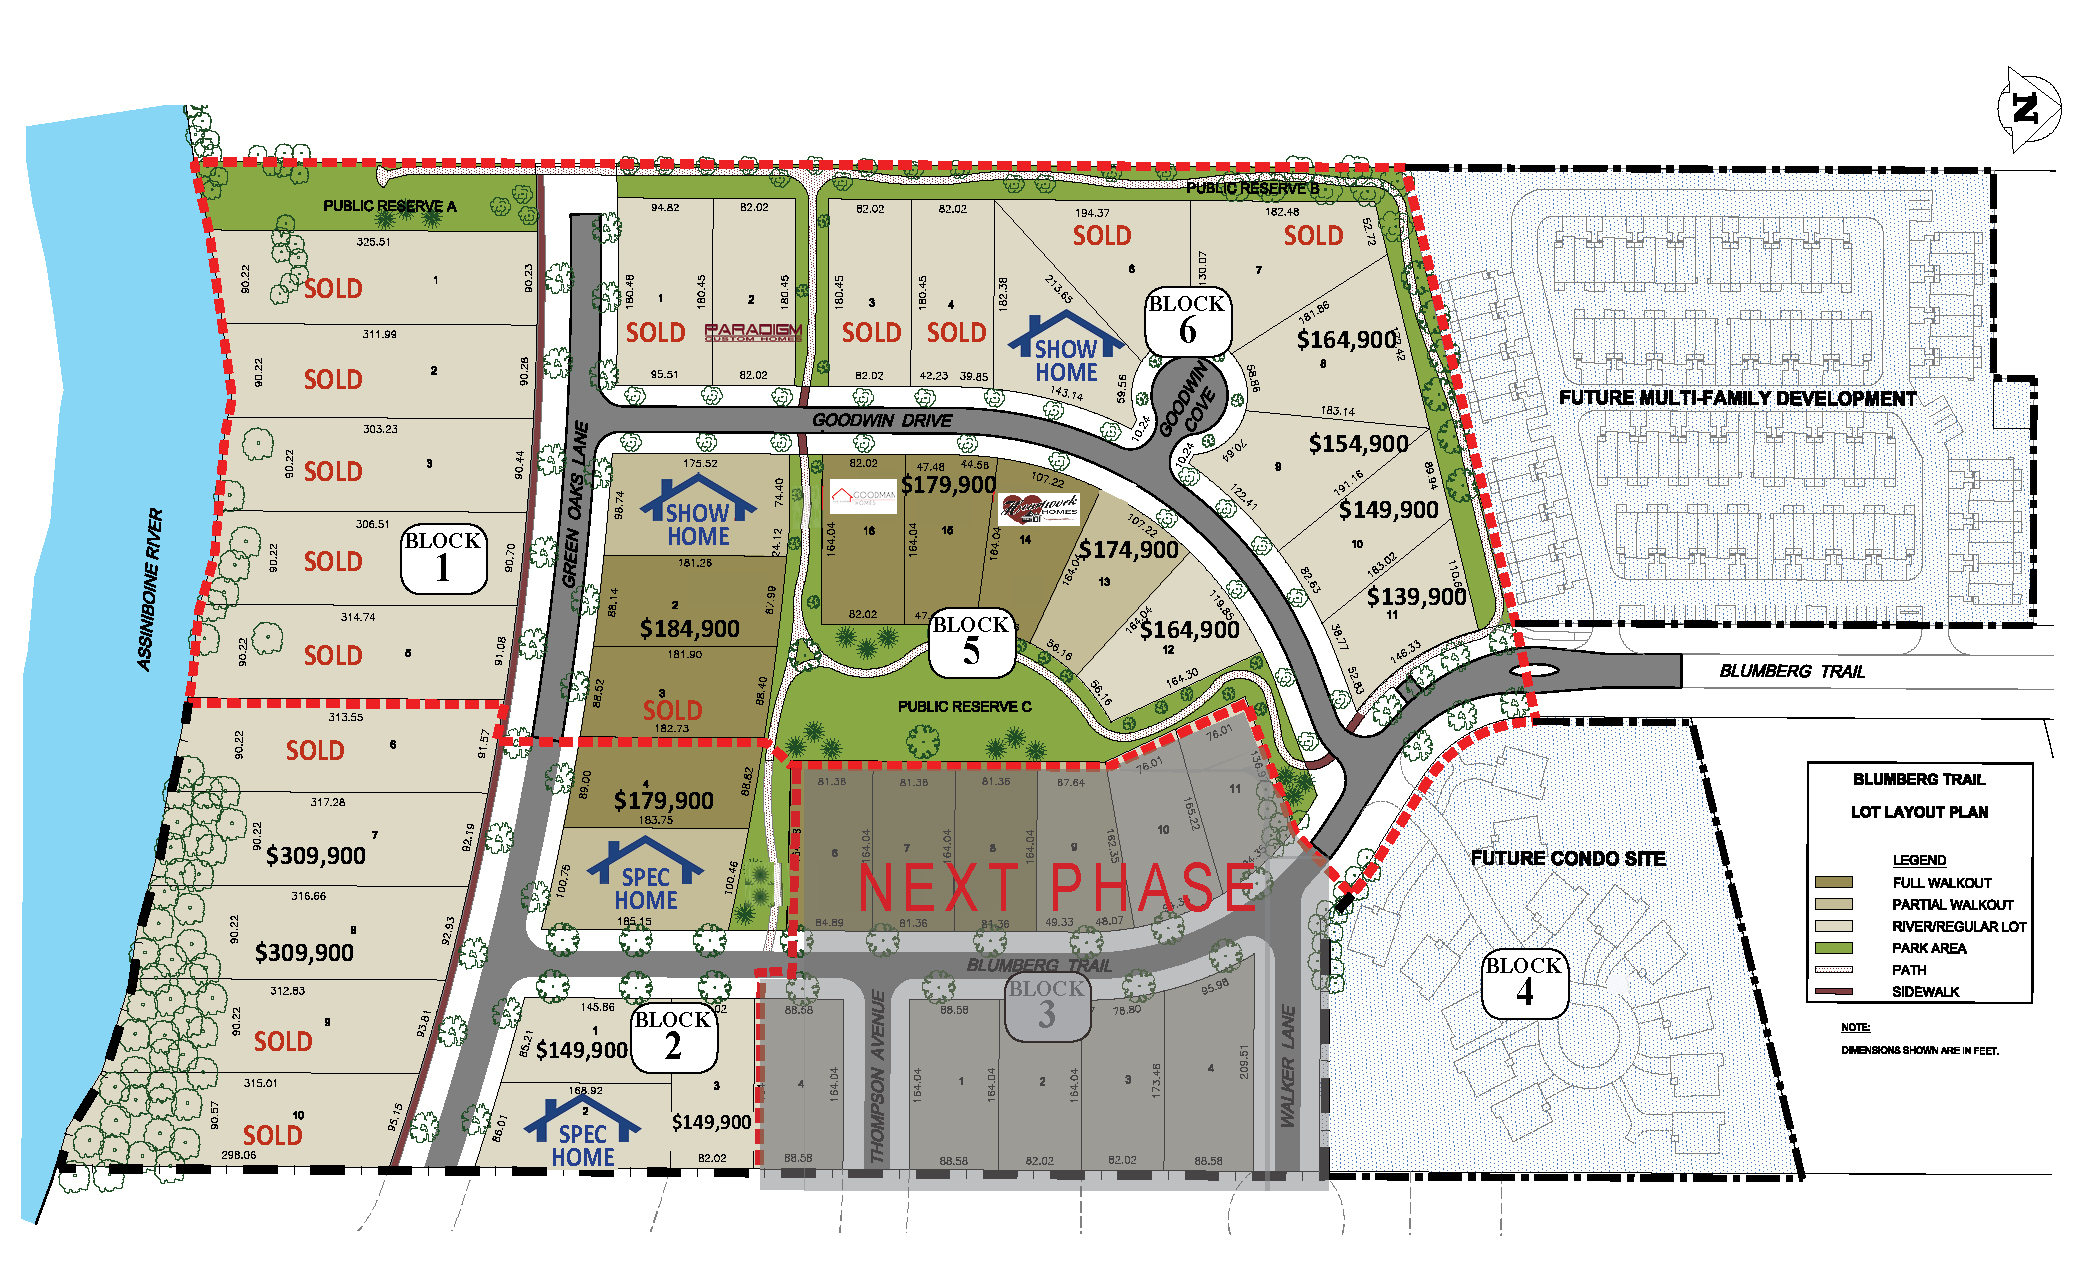 Blumberg Trail Development Site Map